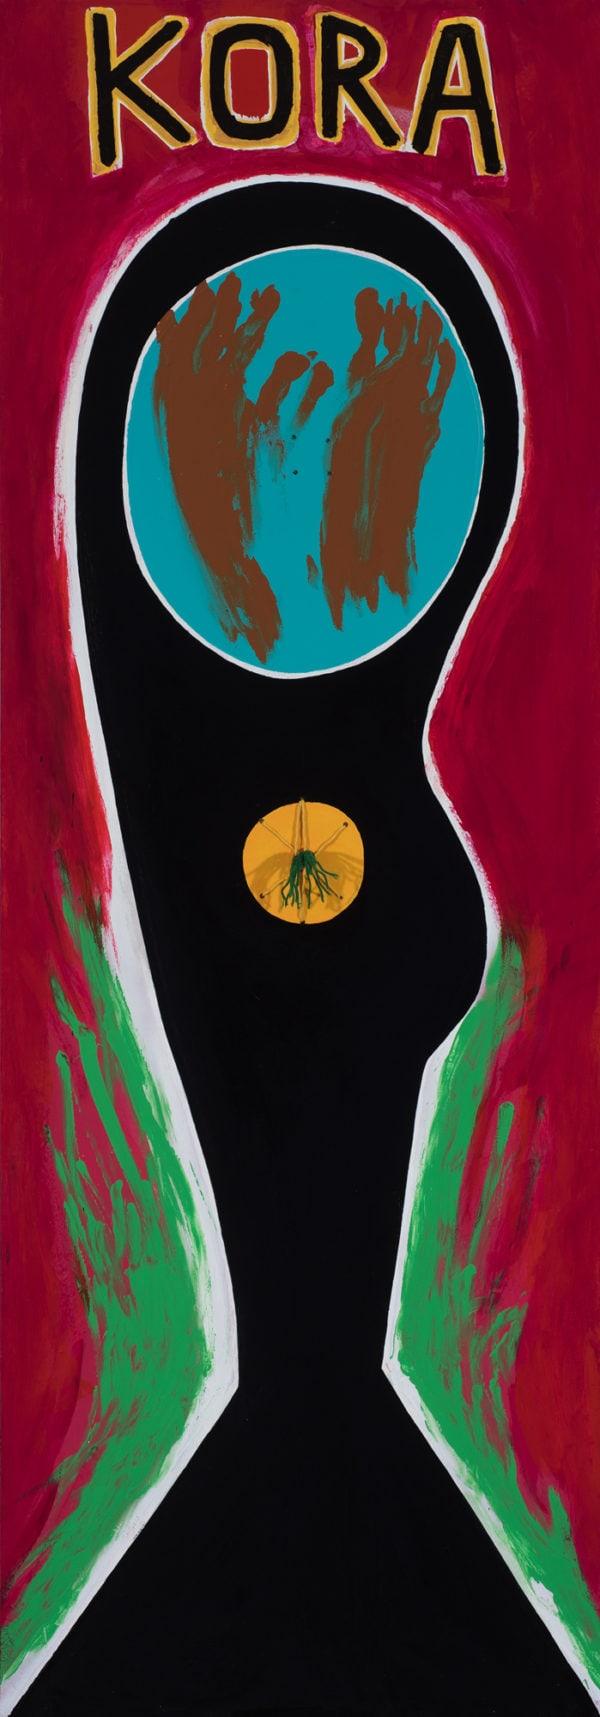 Eric Bridgman, Kora (front), 170x60cm